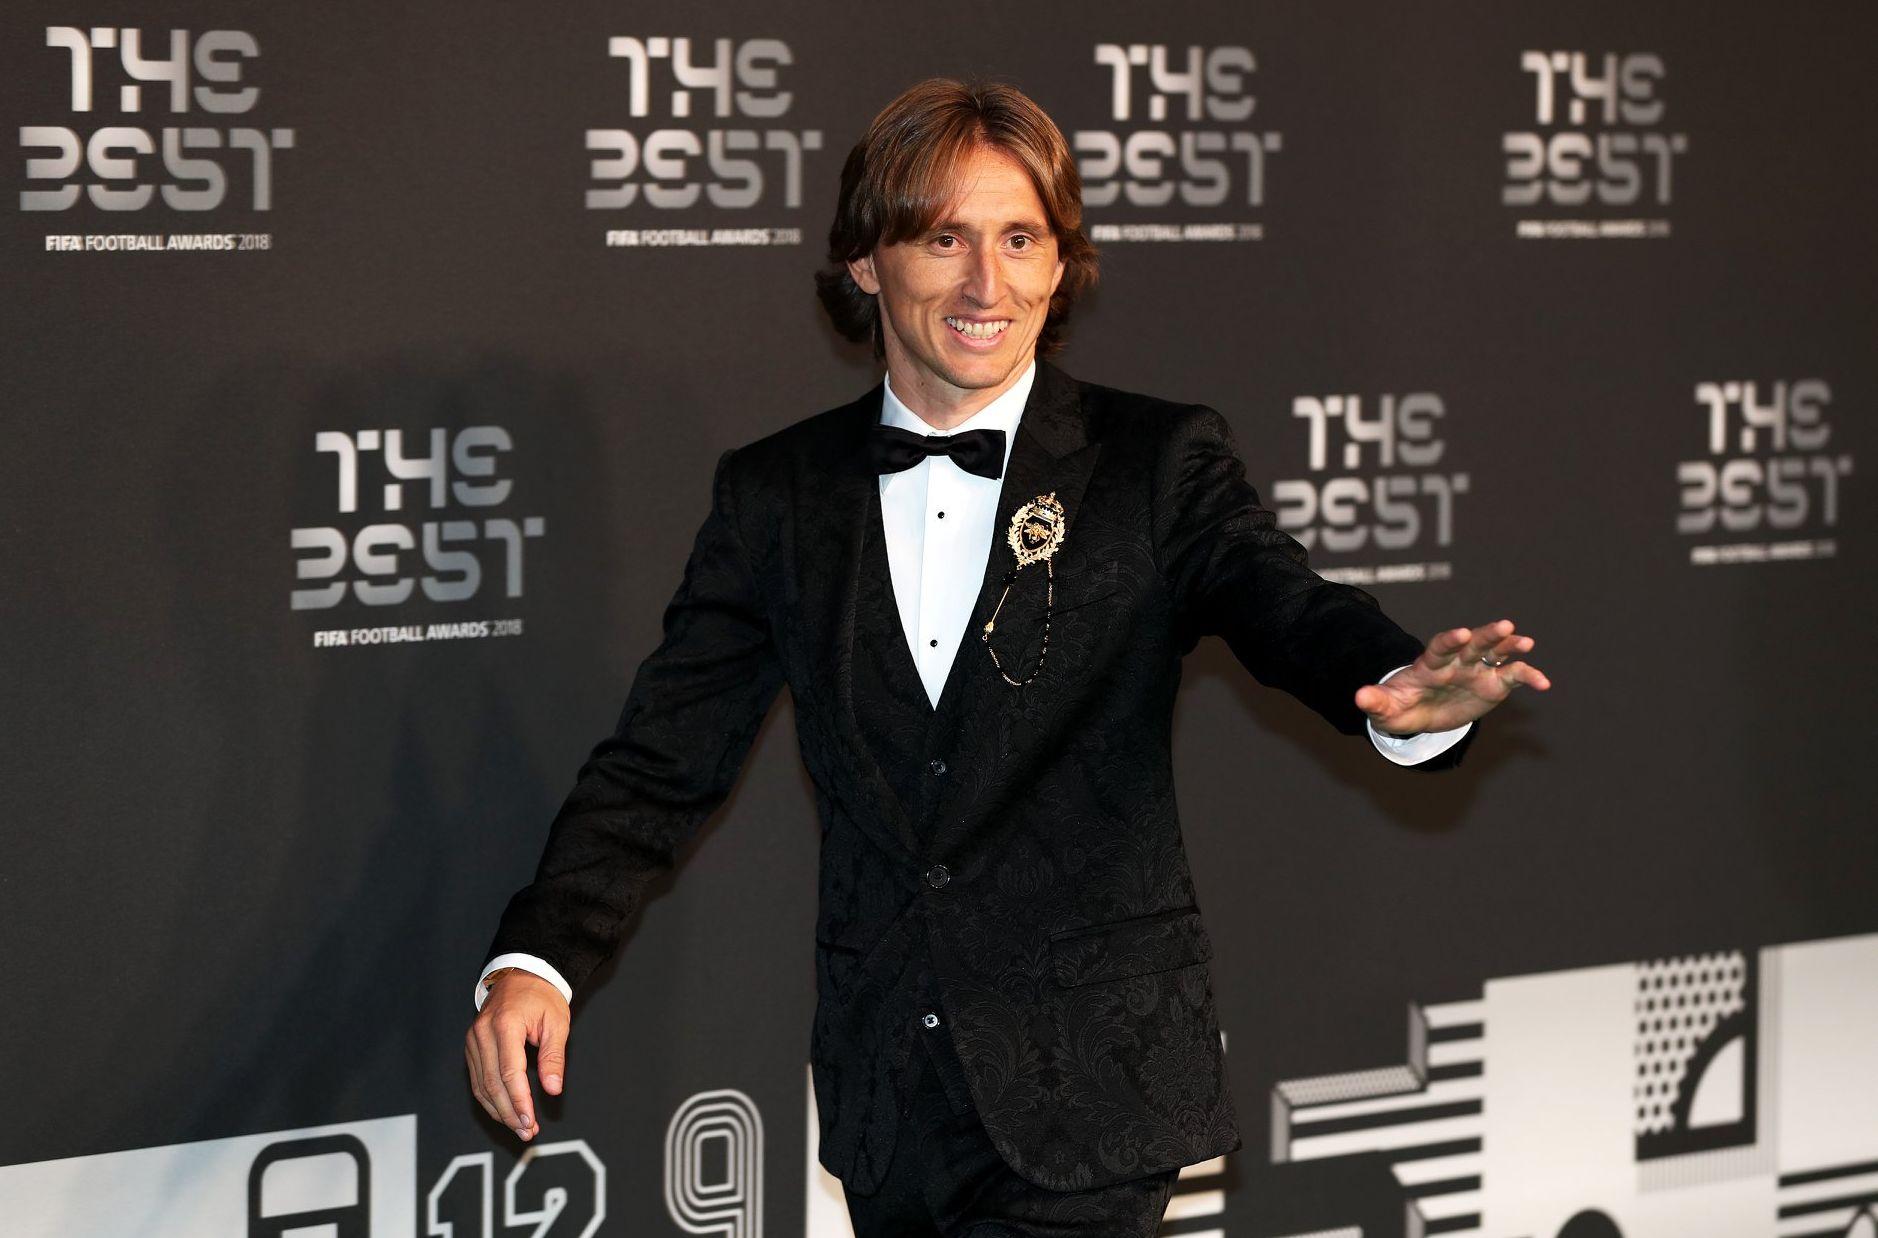 luka-modric-the-best-football-awards.jpg